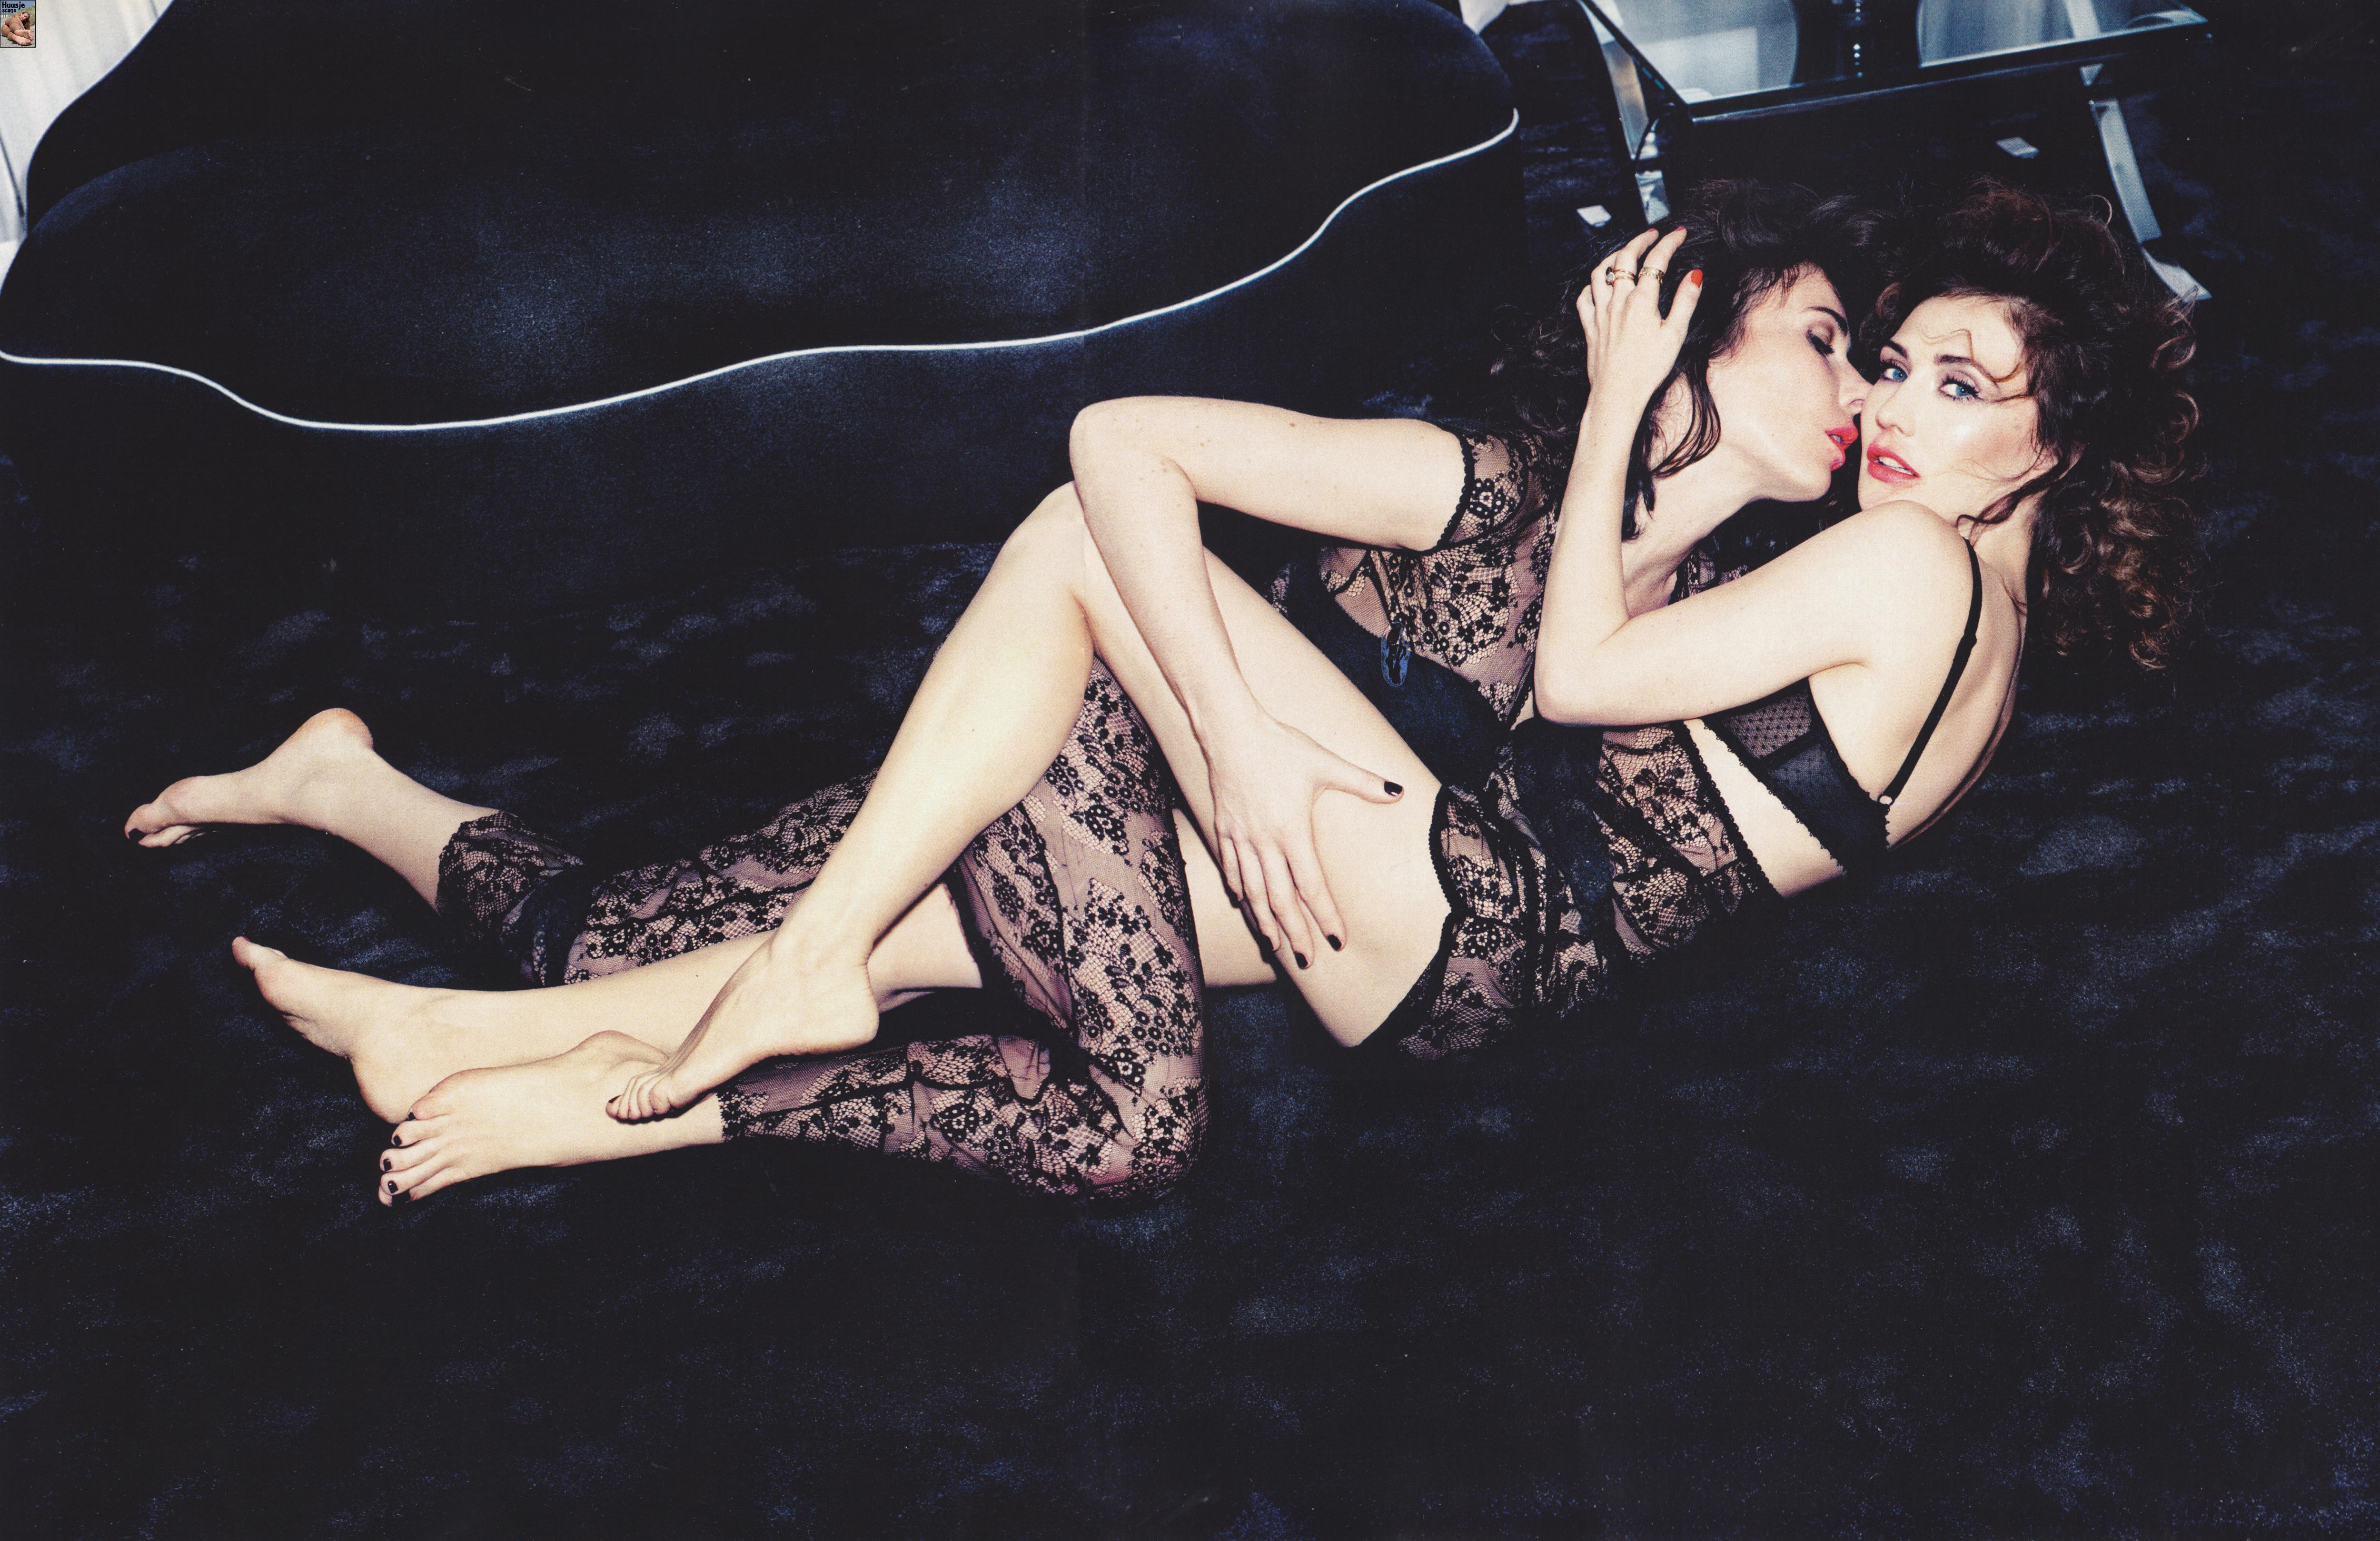 nude Hot Kaya Scodelario (82 images) Young, Instagram, butt